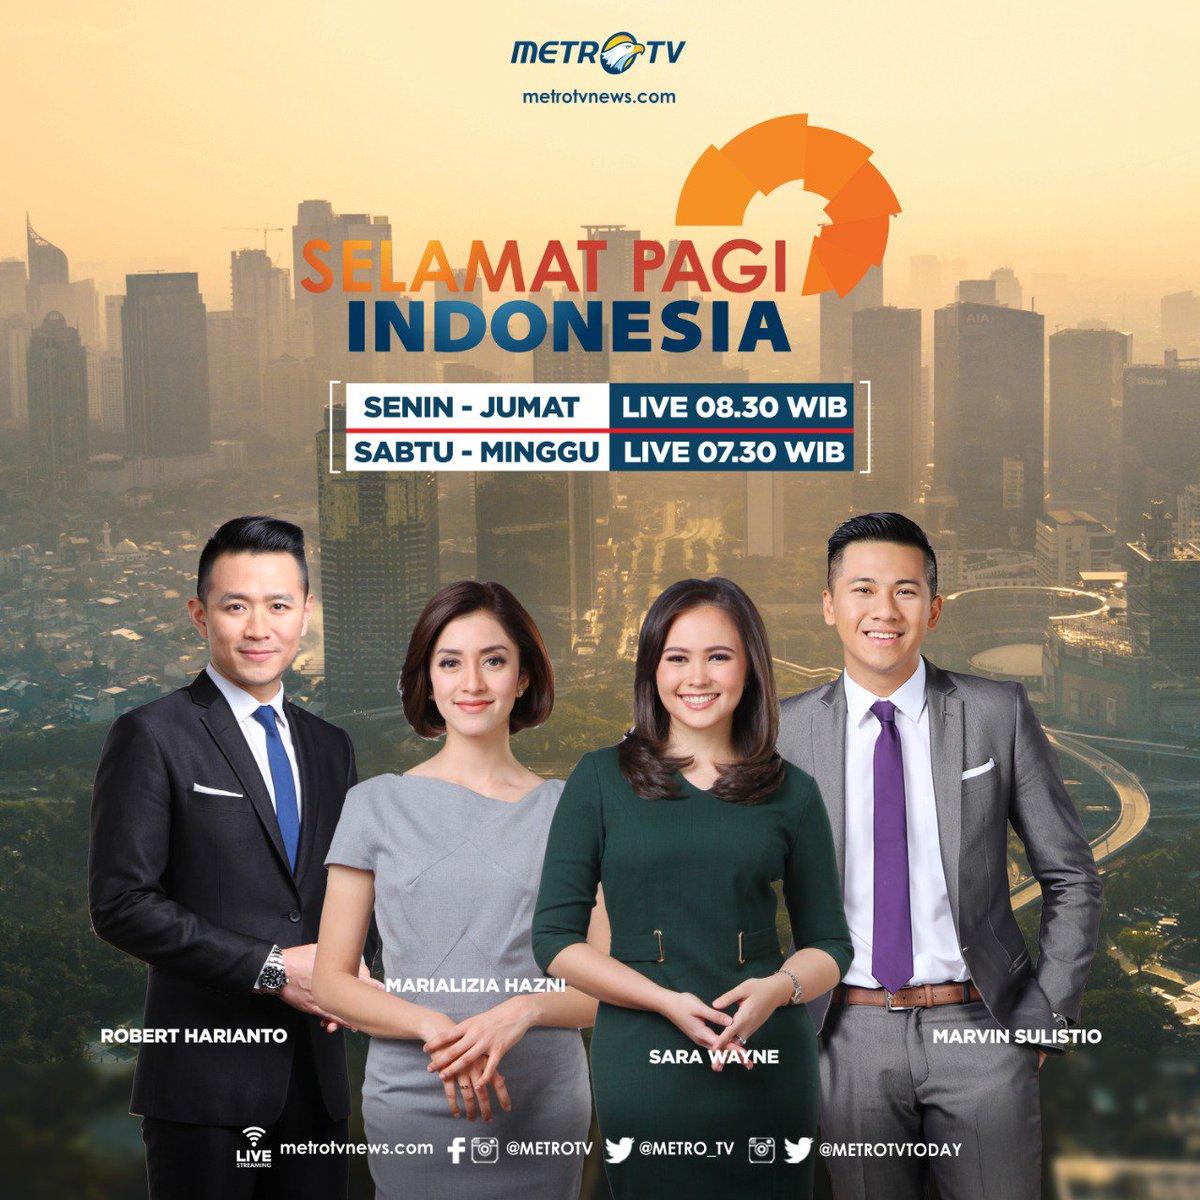 Dapatkan berbagai informasi untuk memulai pagi hari Anda dengan semangat, di #SelamatPagiIndonesia bersama Robert Harianto, Sara Wayne, Marvin Sulistio, dan Marializia Hasni, setiap Senin-Jumat pkl 08.30 WIB dan Sabtu-Minggu pkl 07.30 WIB di #MetroTV. #SPIMetroTV